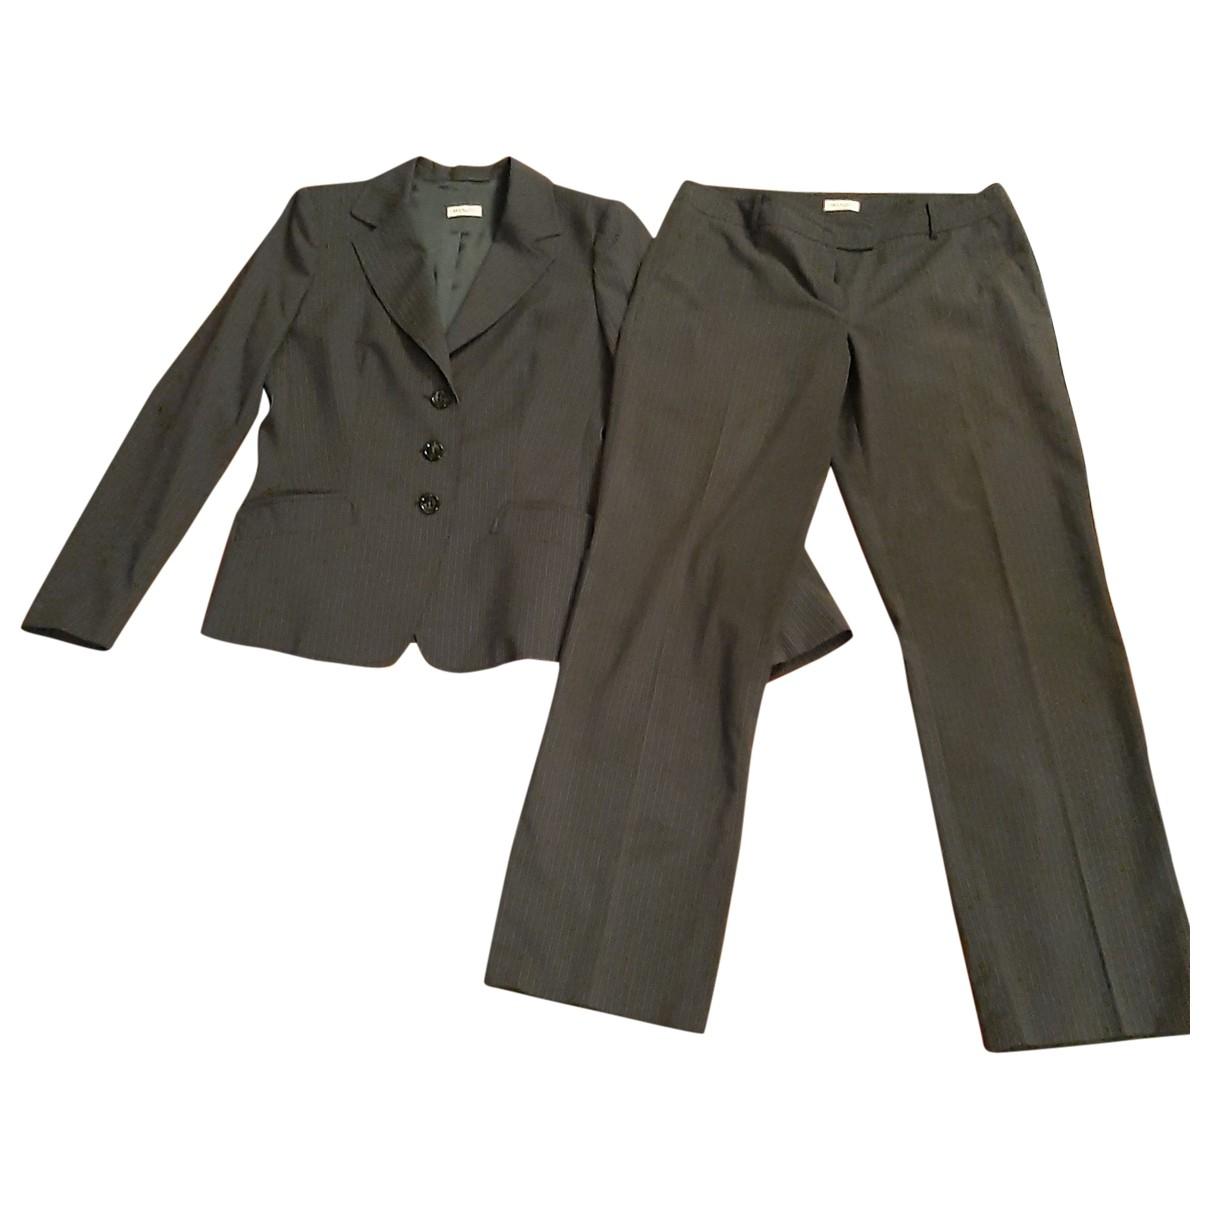 Max & Co \N Jacke in  Grau Polyester